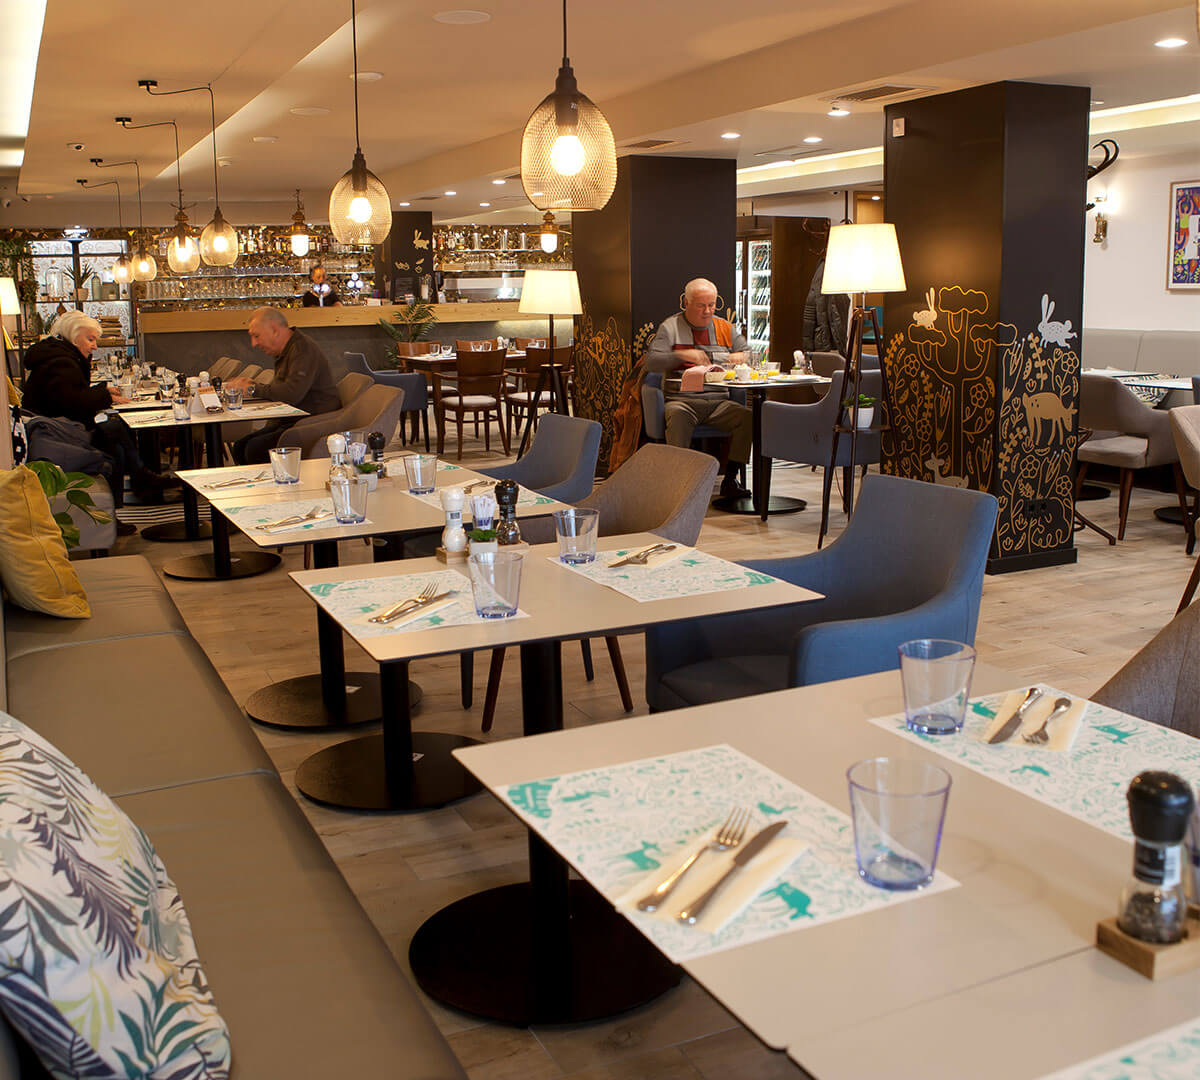 Hopsz Café & Grill